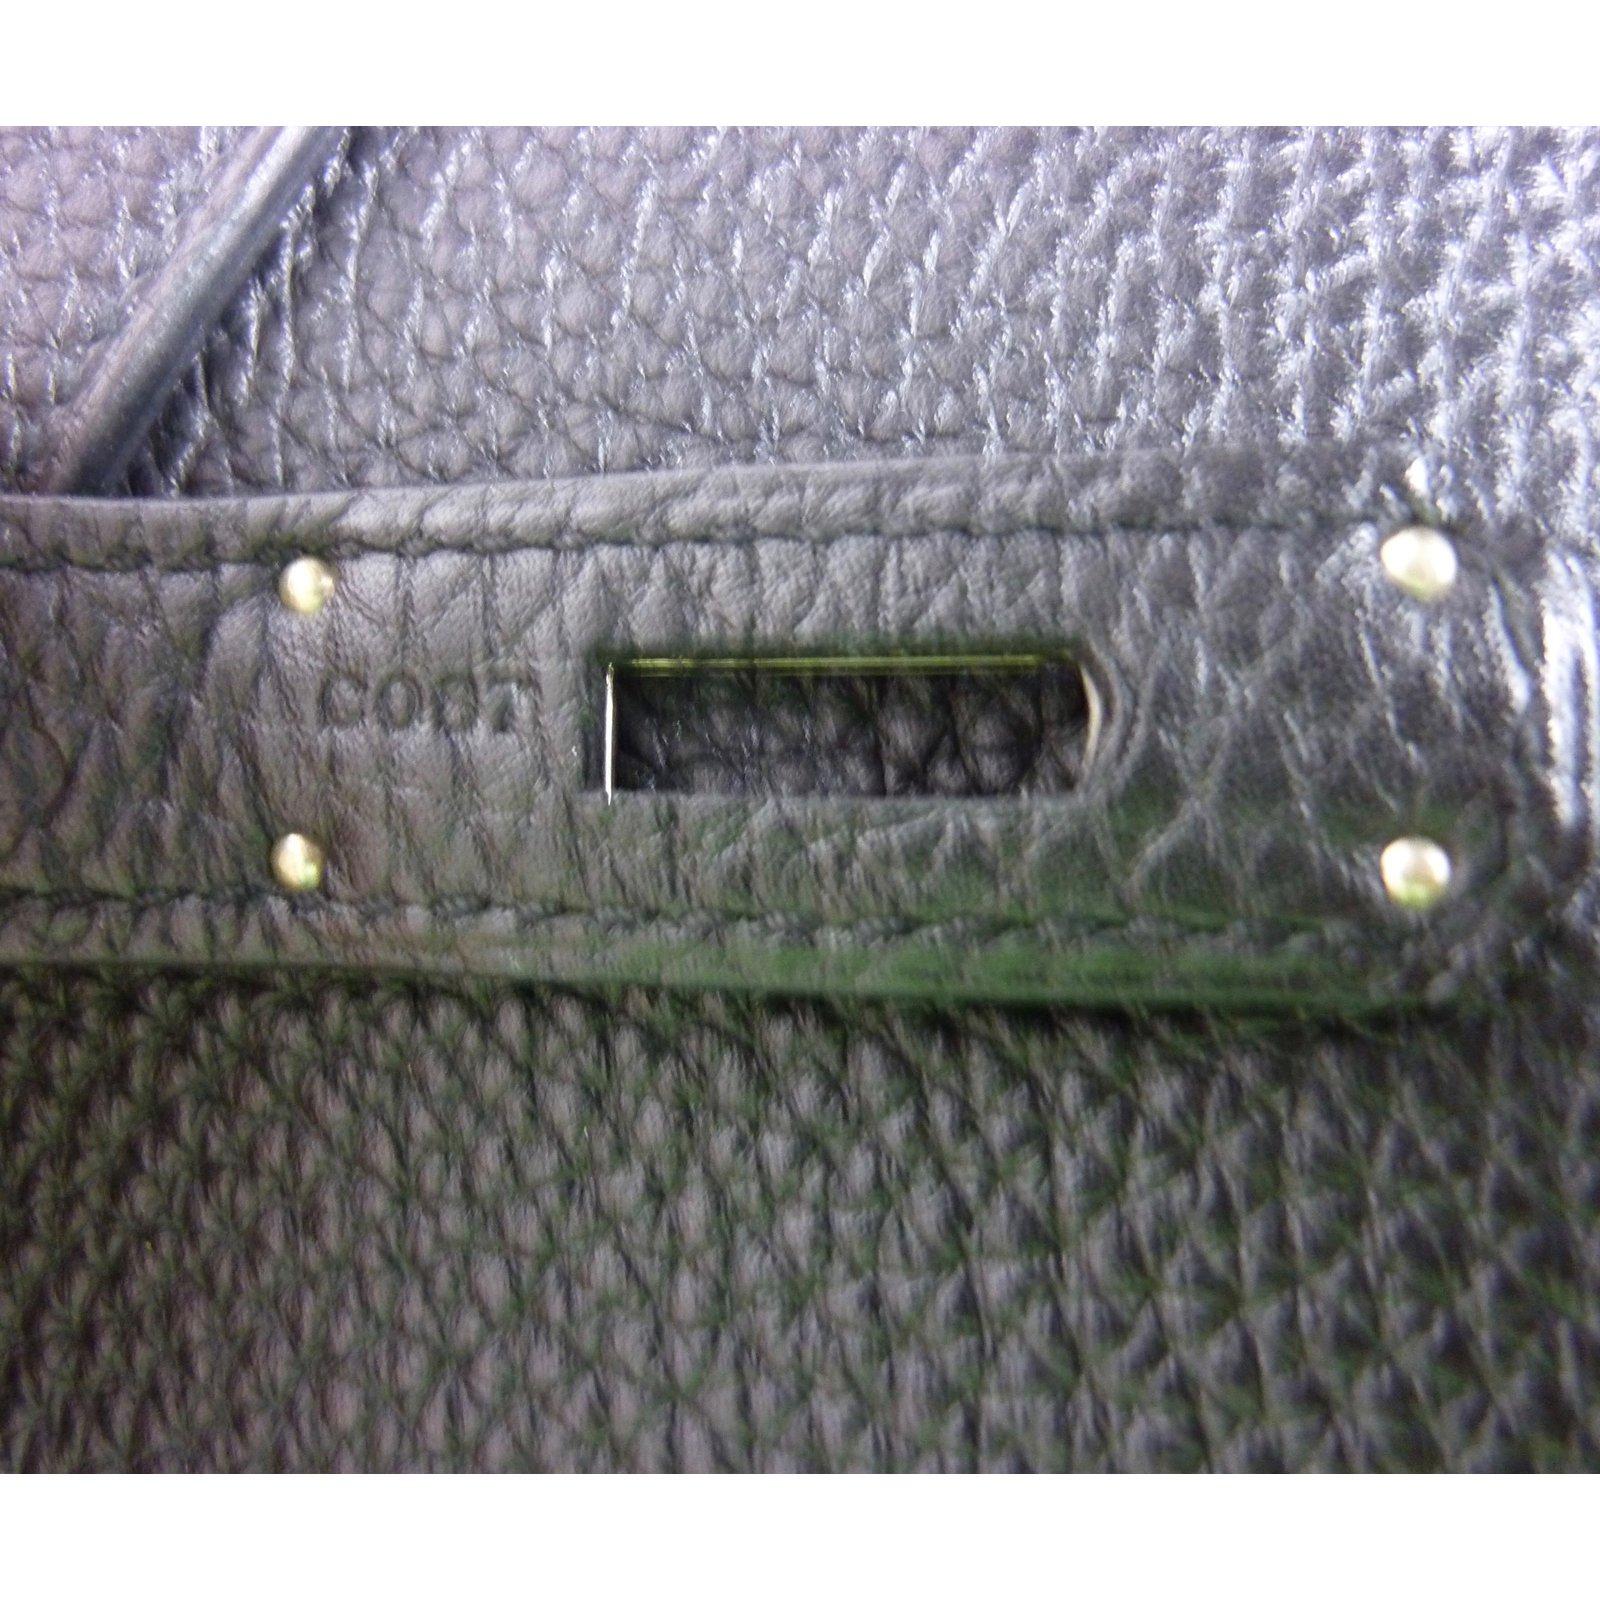 997d5d000e Sacs à main Hermès Sublime Sac Hermès Birkin 35 en cuir Togo noir / Etat  neuf. Cuir Noir ref.39341 - Joli Closet